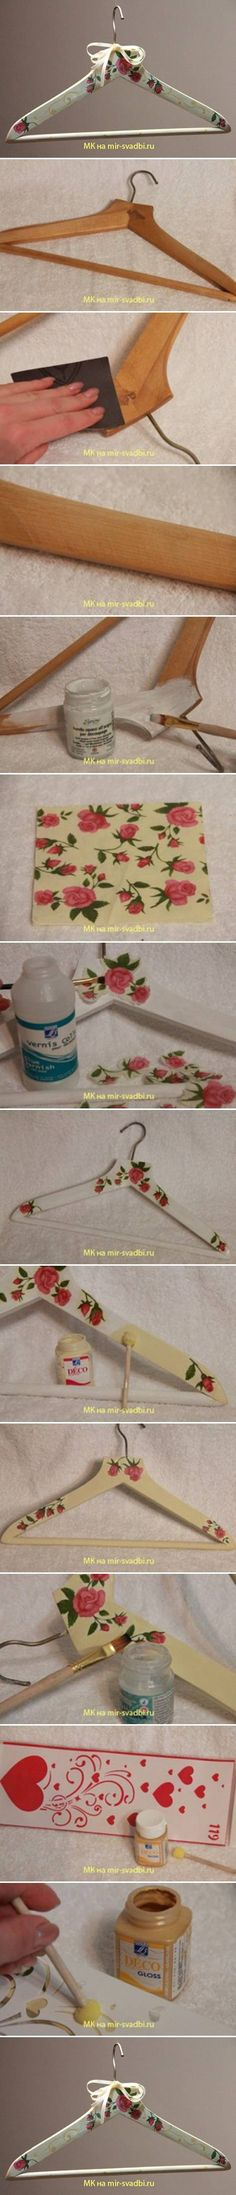 DIY Hanger Decoupage